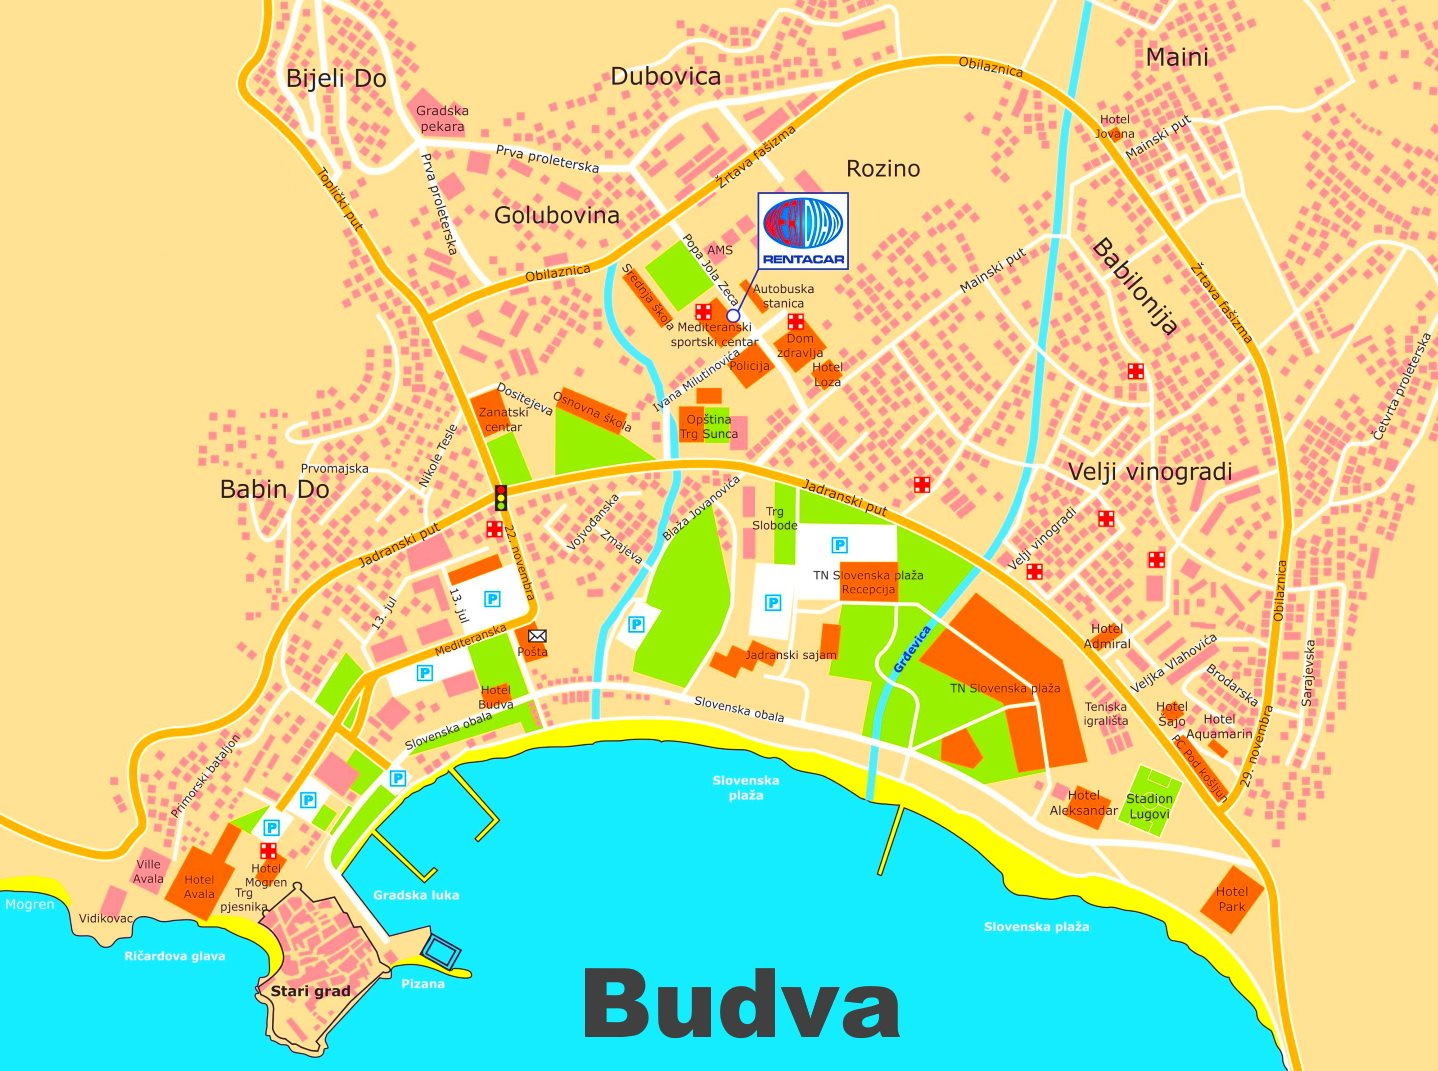 Budva Tourist Map